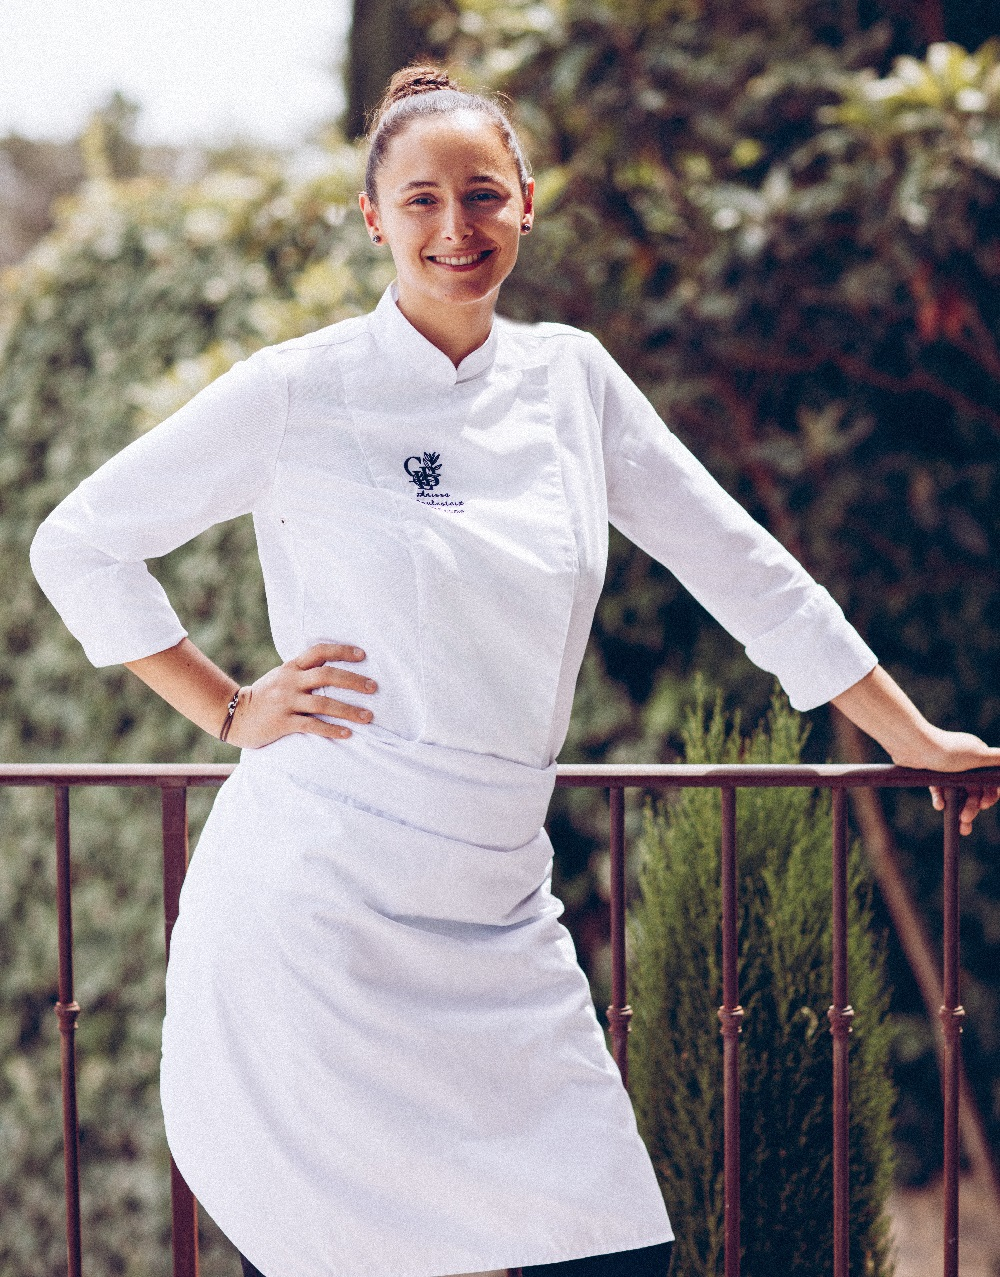 Anissa Boulesteix